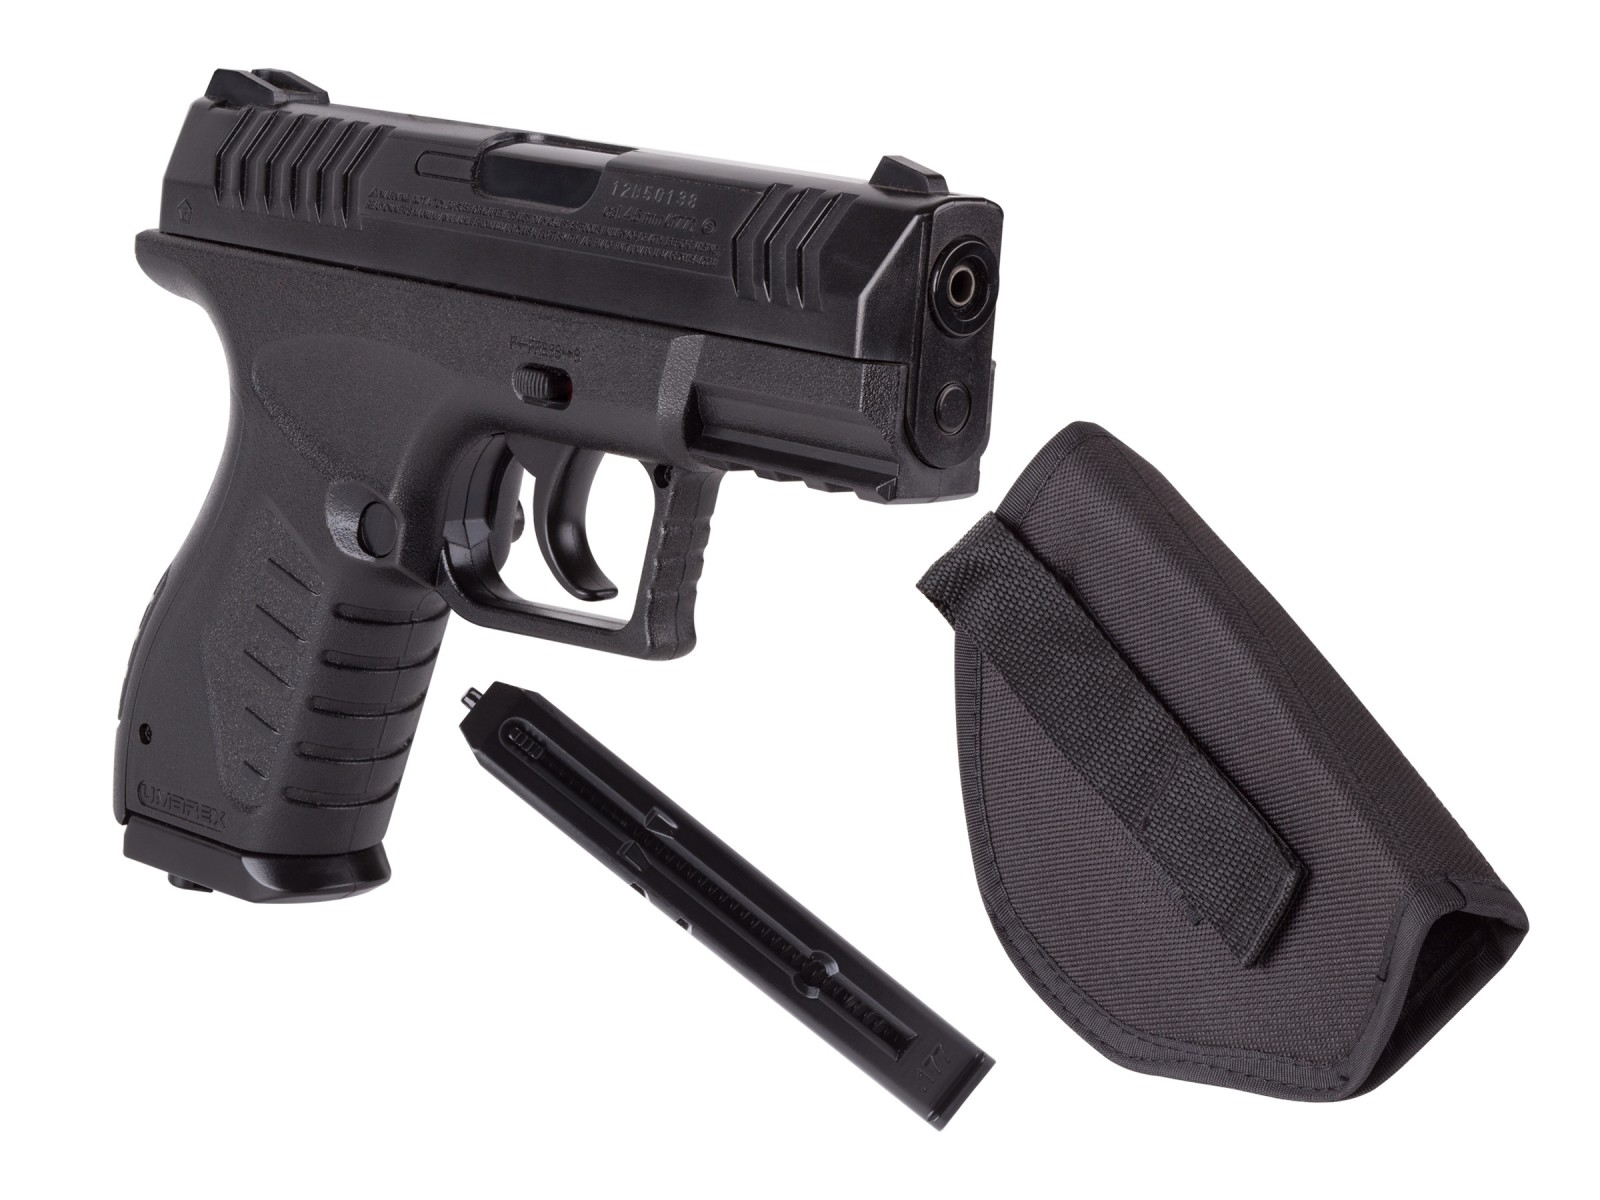 Umarex XBG CO2 Pistol Kit